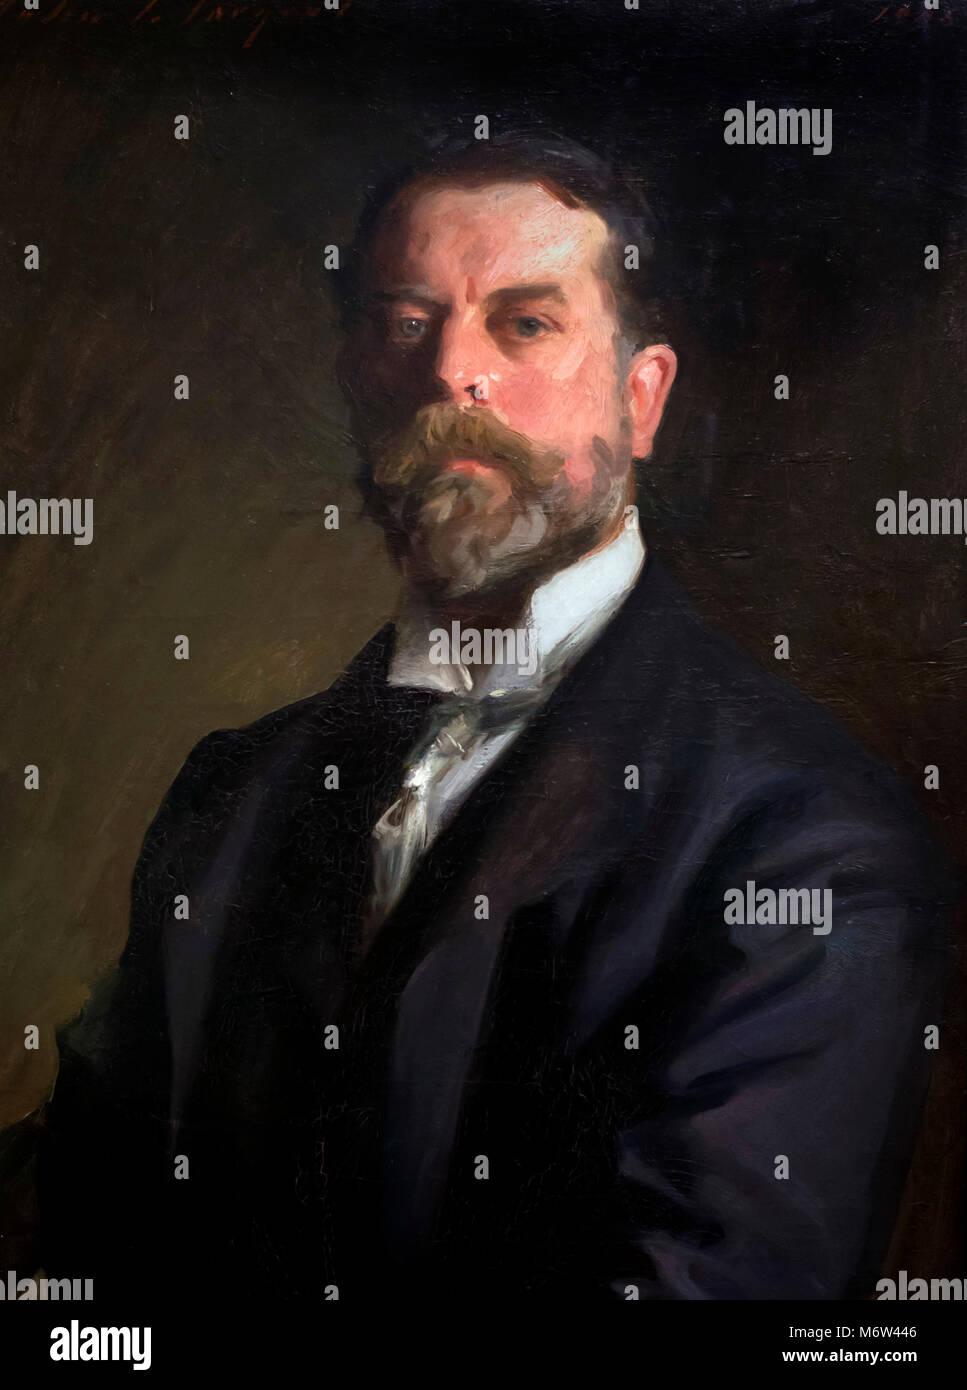 John Singer Sargent (1856-1925), self -portrait, oil on canvas, 1906 - Stock Image